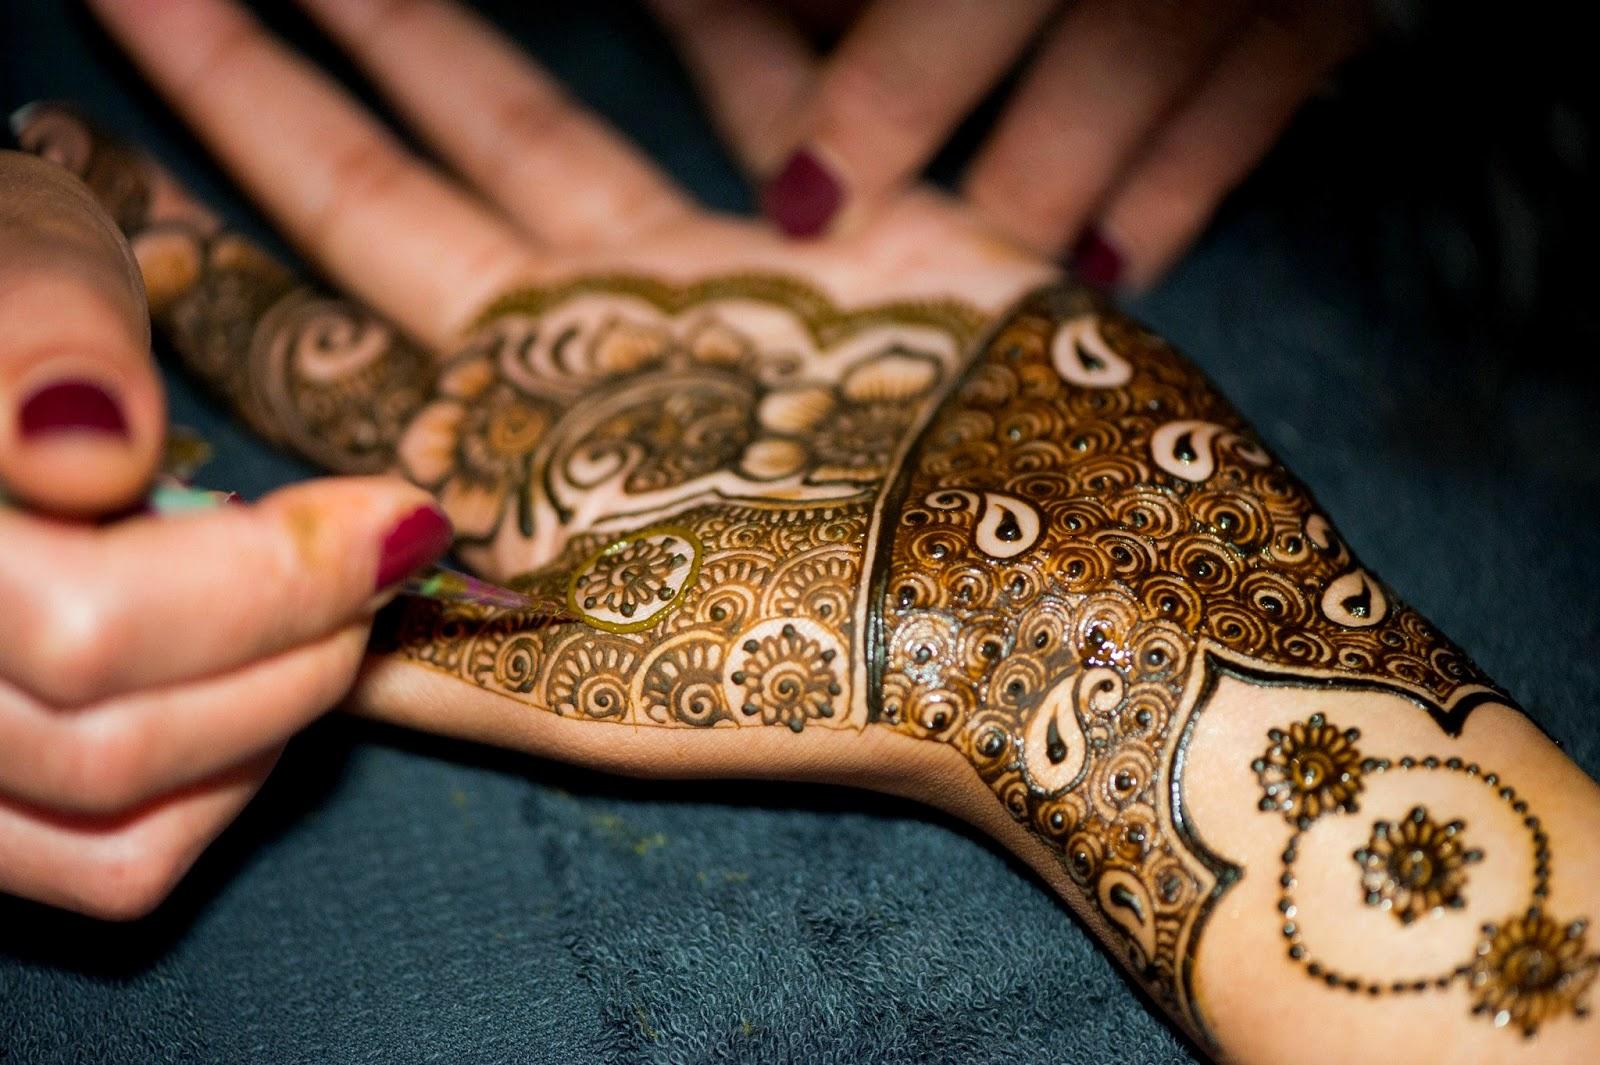 Simple Eid Mehndi Designs 2013 : Eid mehndi designs  best for she